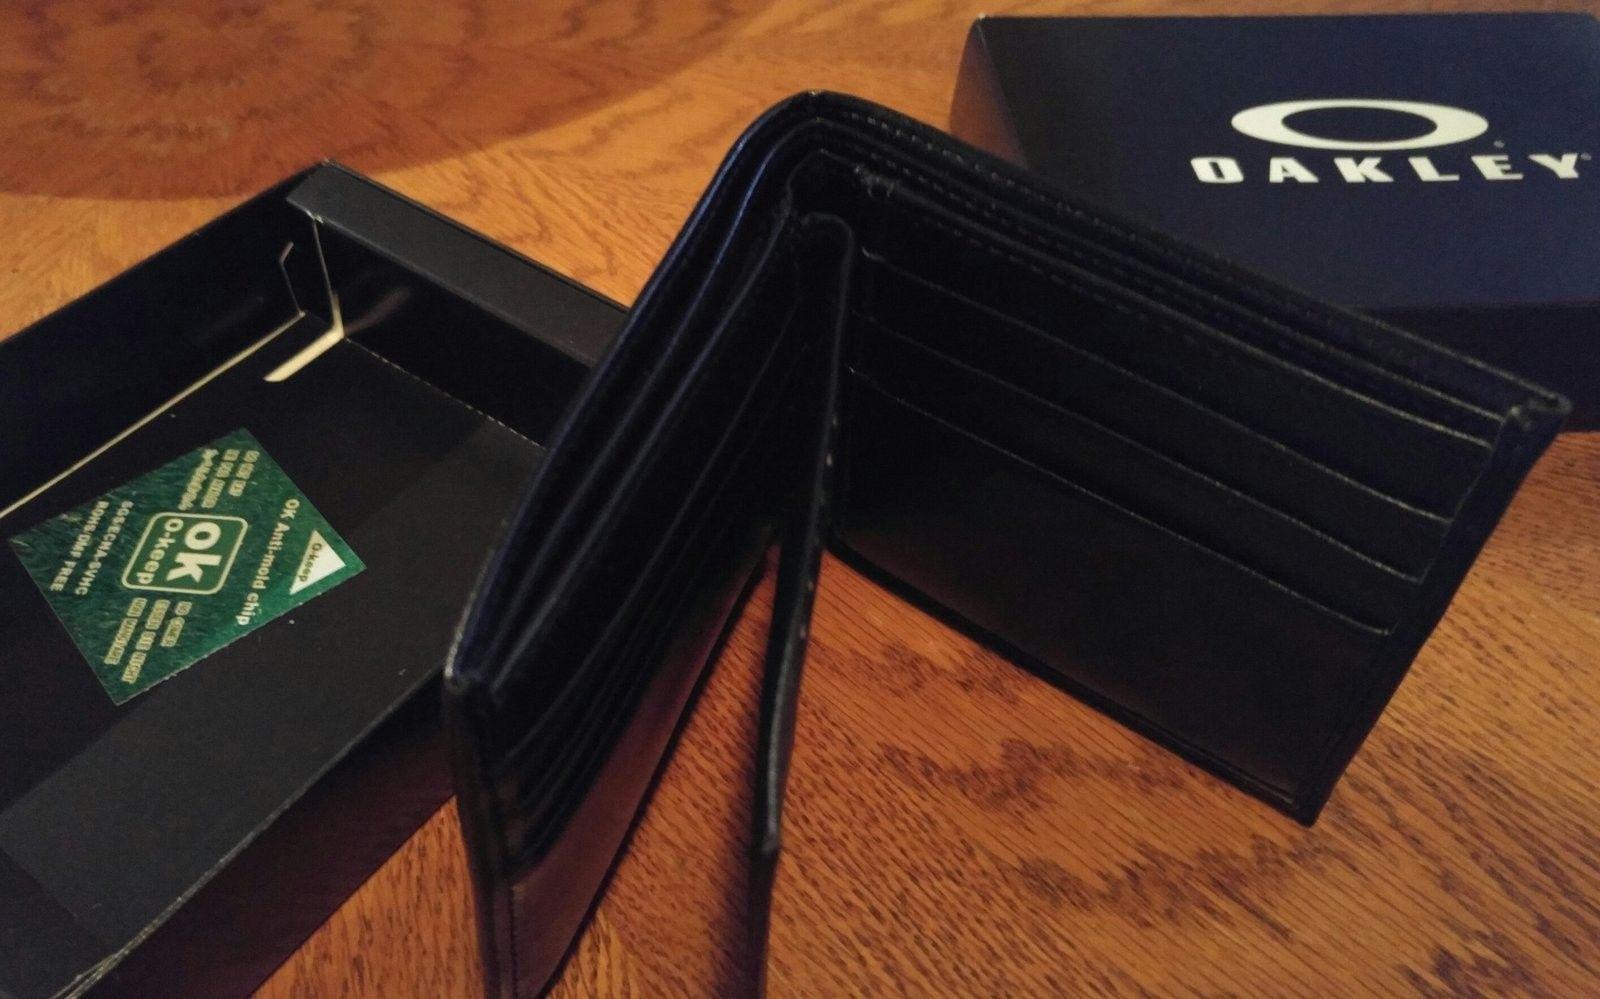 Bnib black leather wallet and bottle opener - 20160412_111541-1.jpg